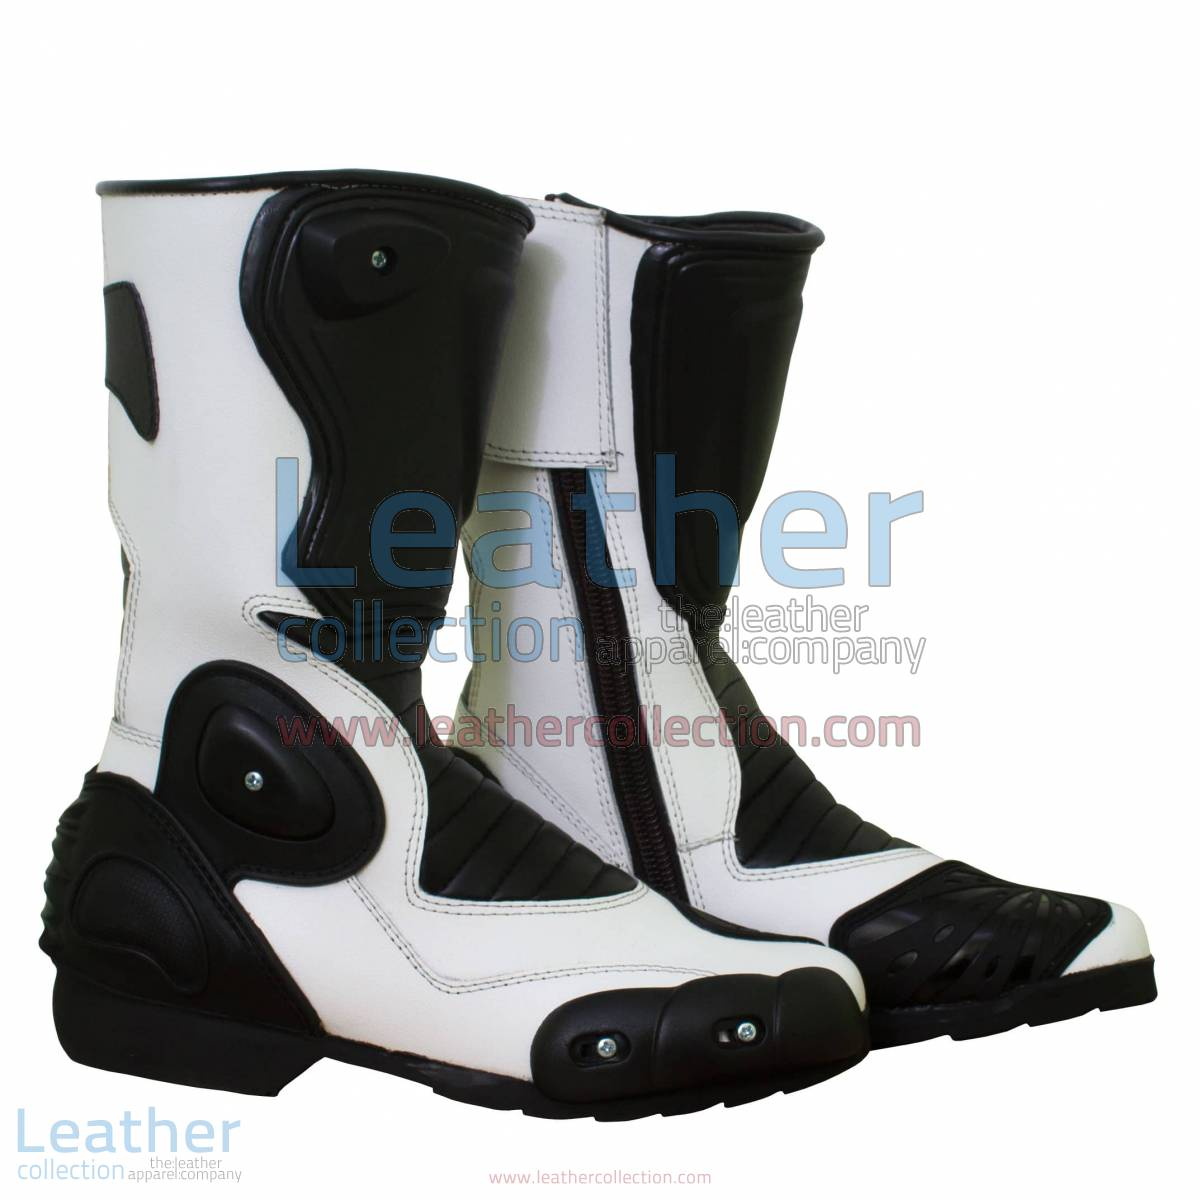 Jorge Lorenzo Special Mila 500 Race Boots | jorge lorenzo